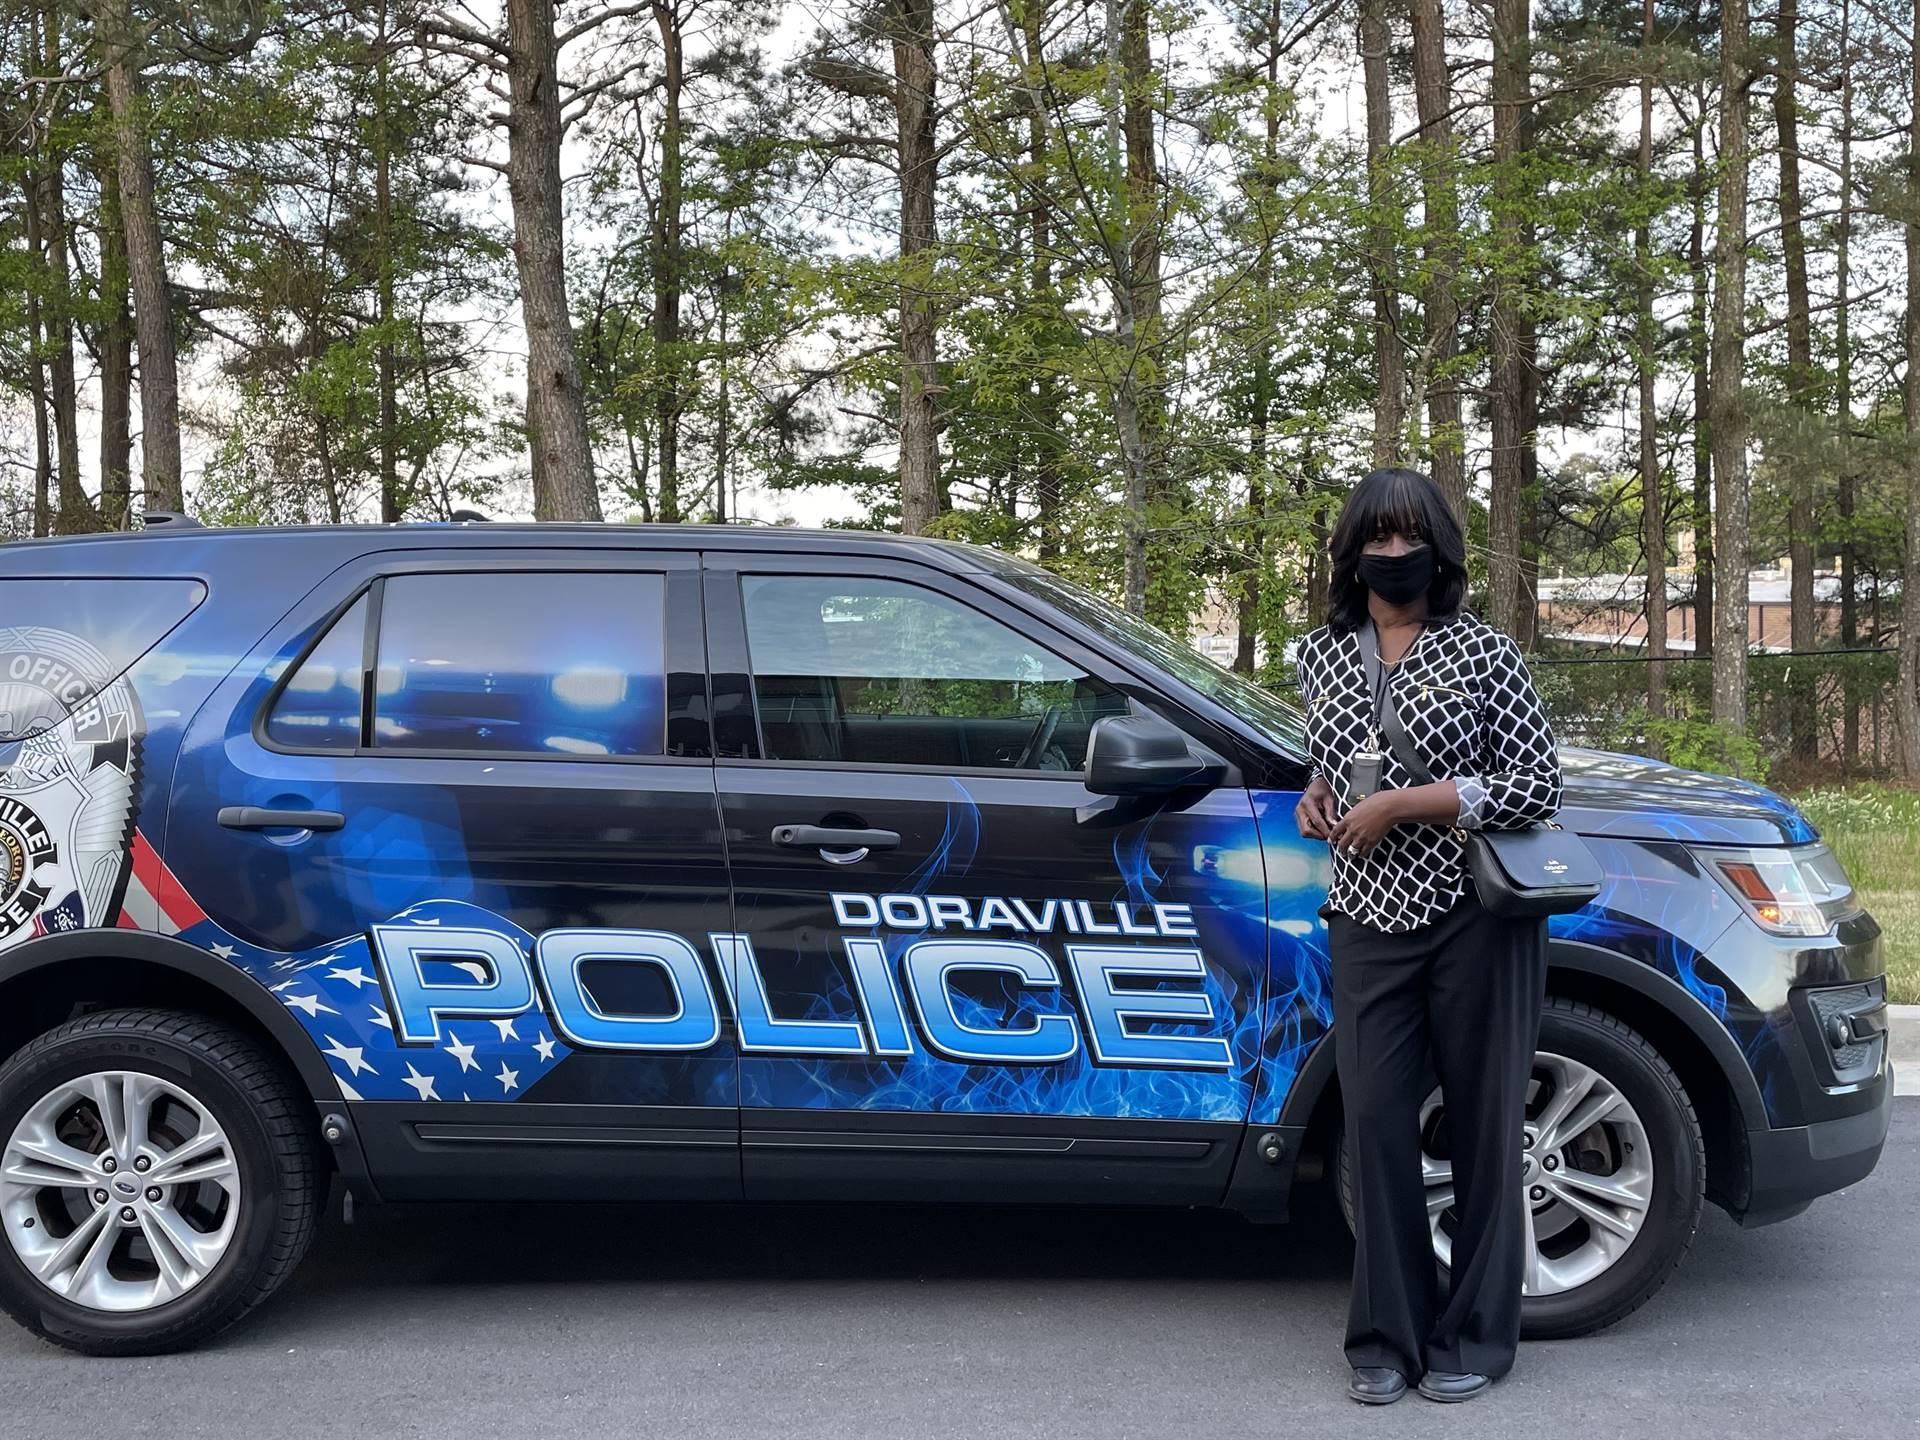 Dr. Jackson with Doraville police car